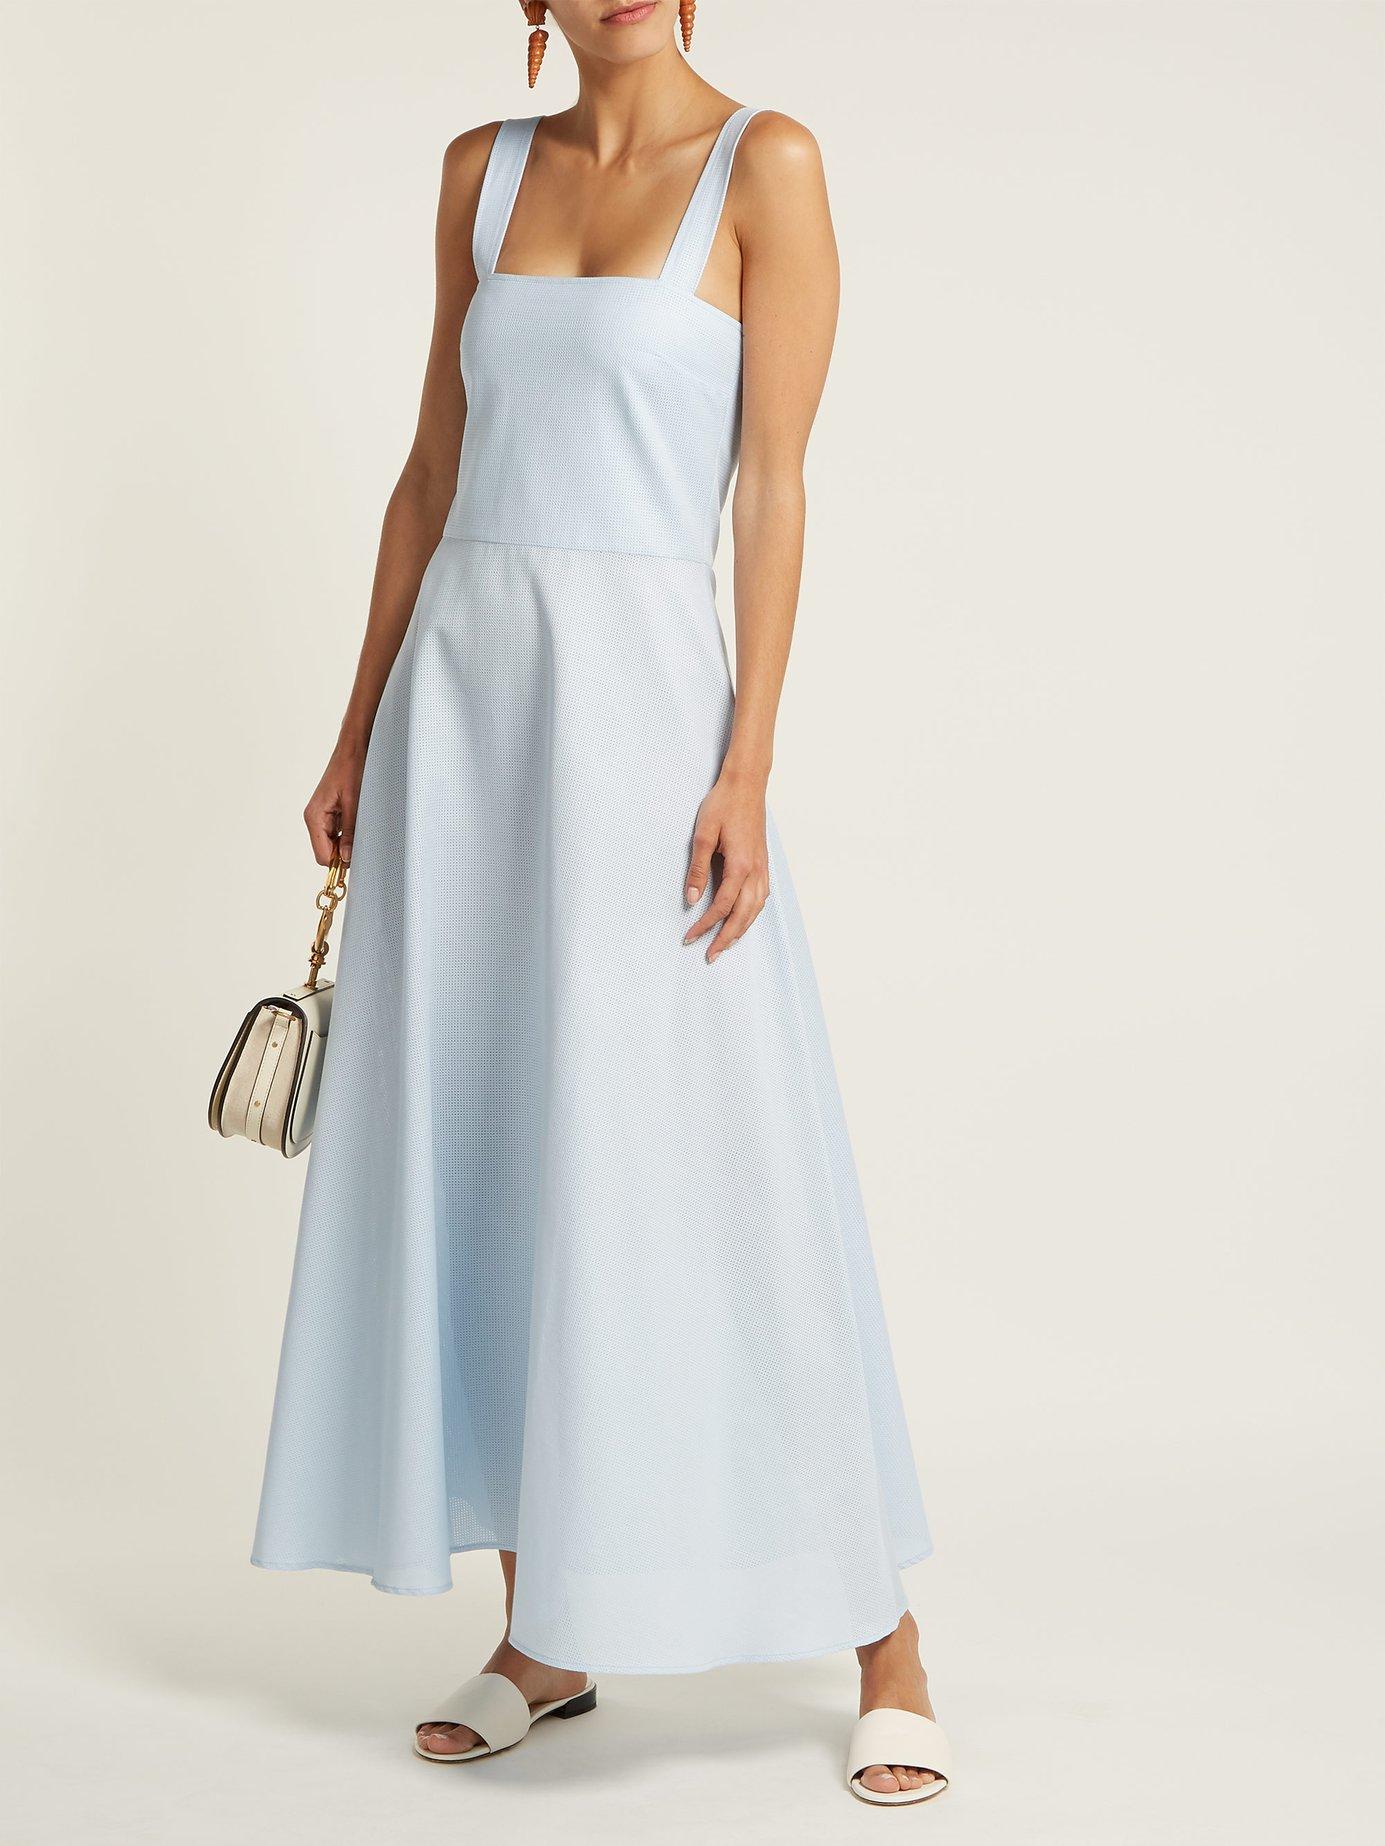 Lucinda cotton dress by Gioia Bini